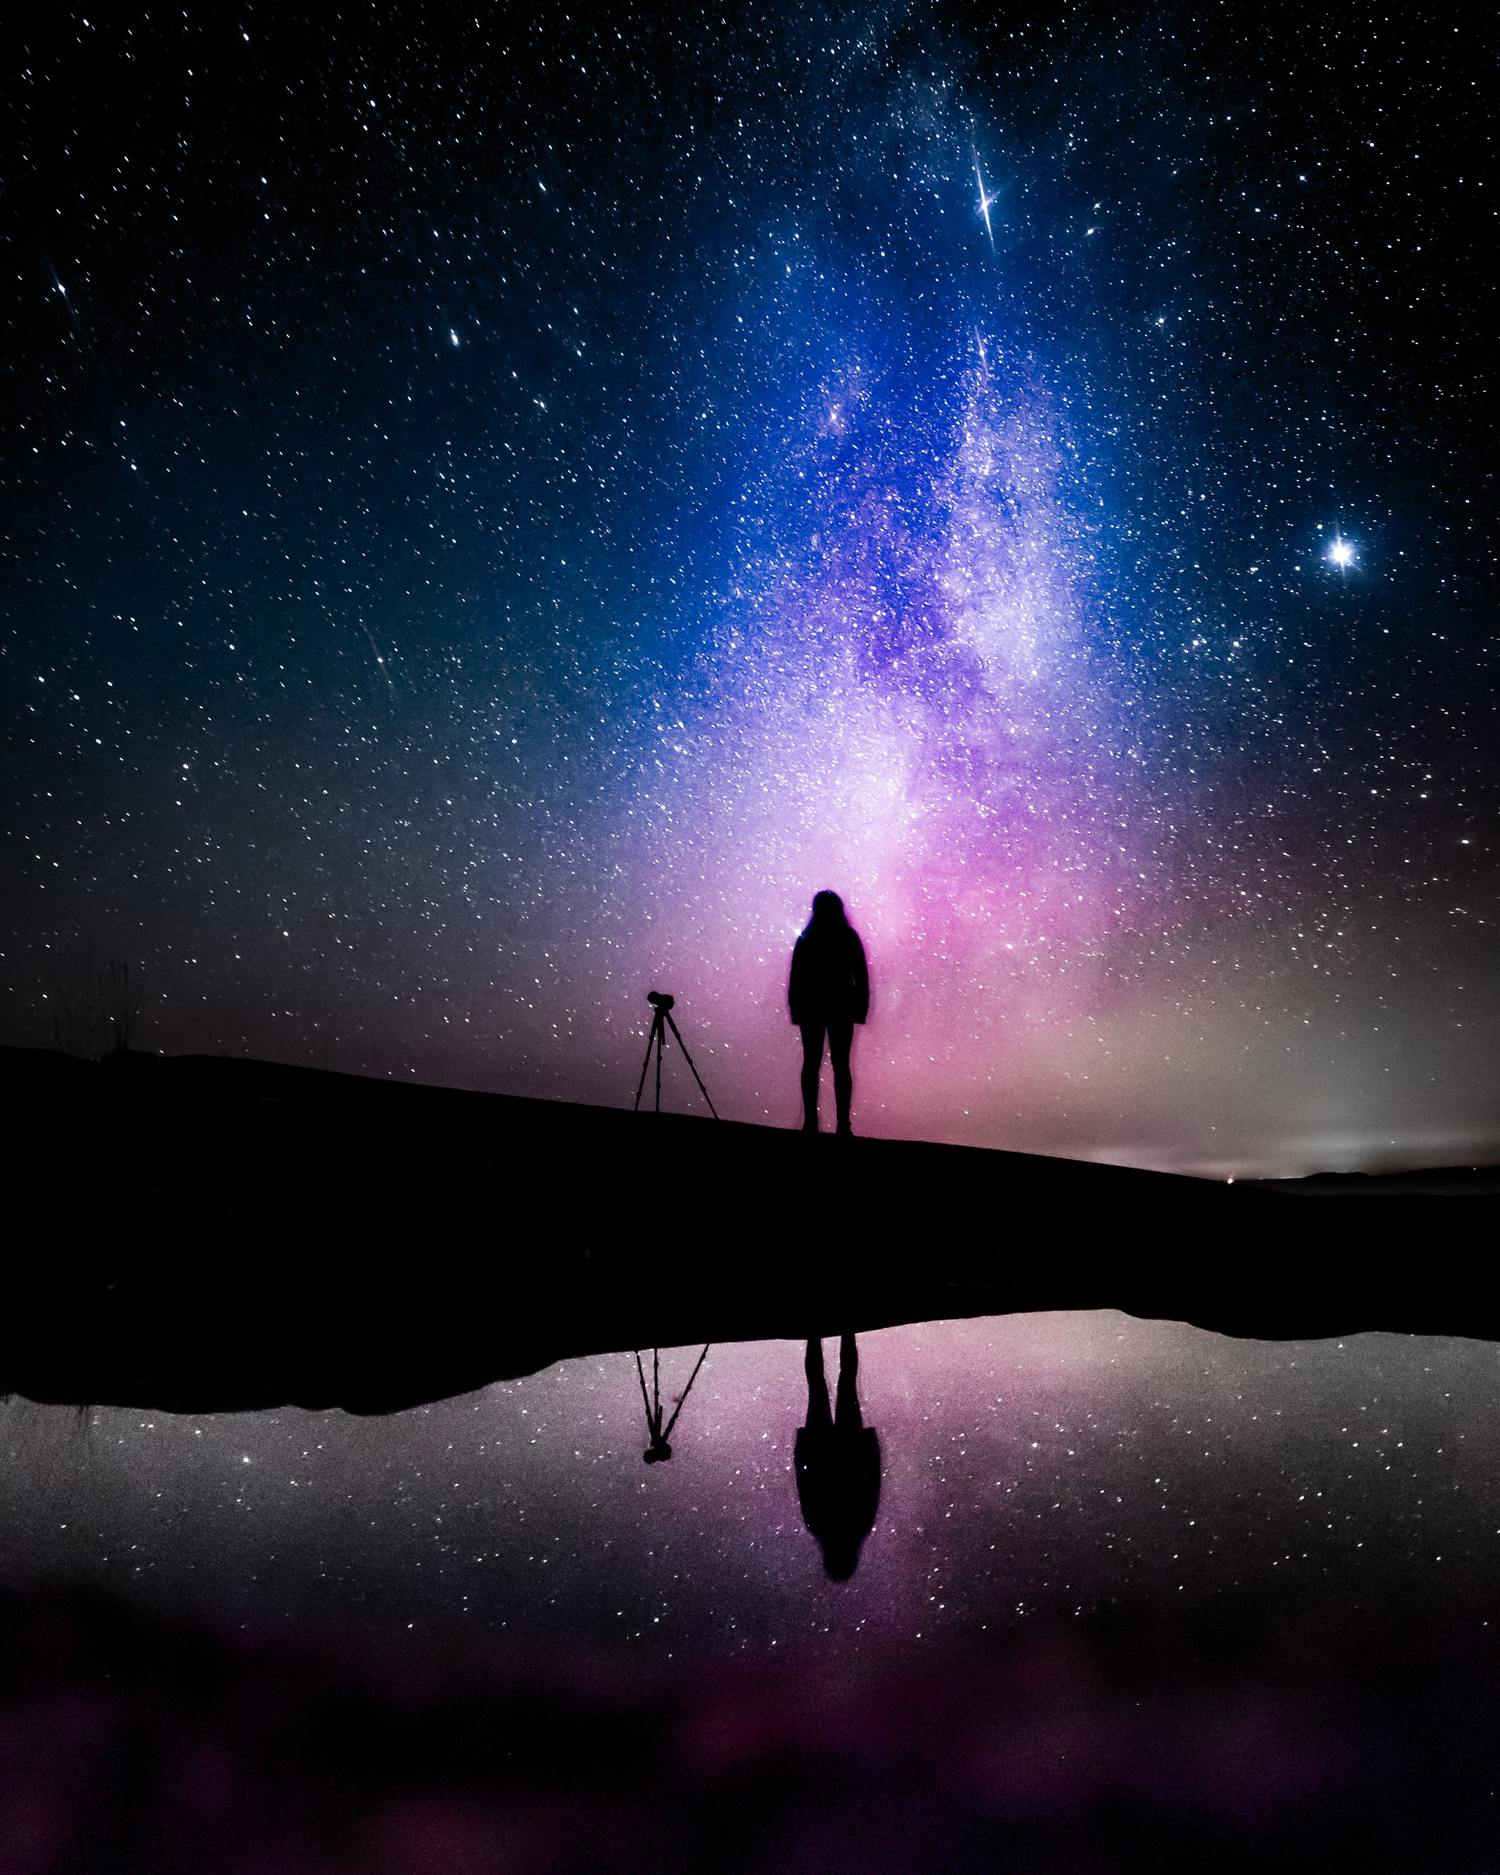 Silueta de fotógrafo con trípode con fondo de cielo estrellado